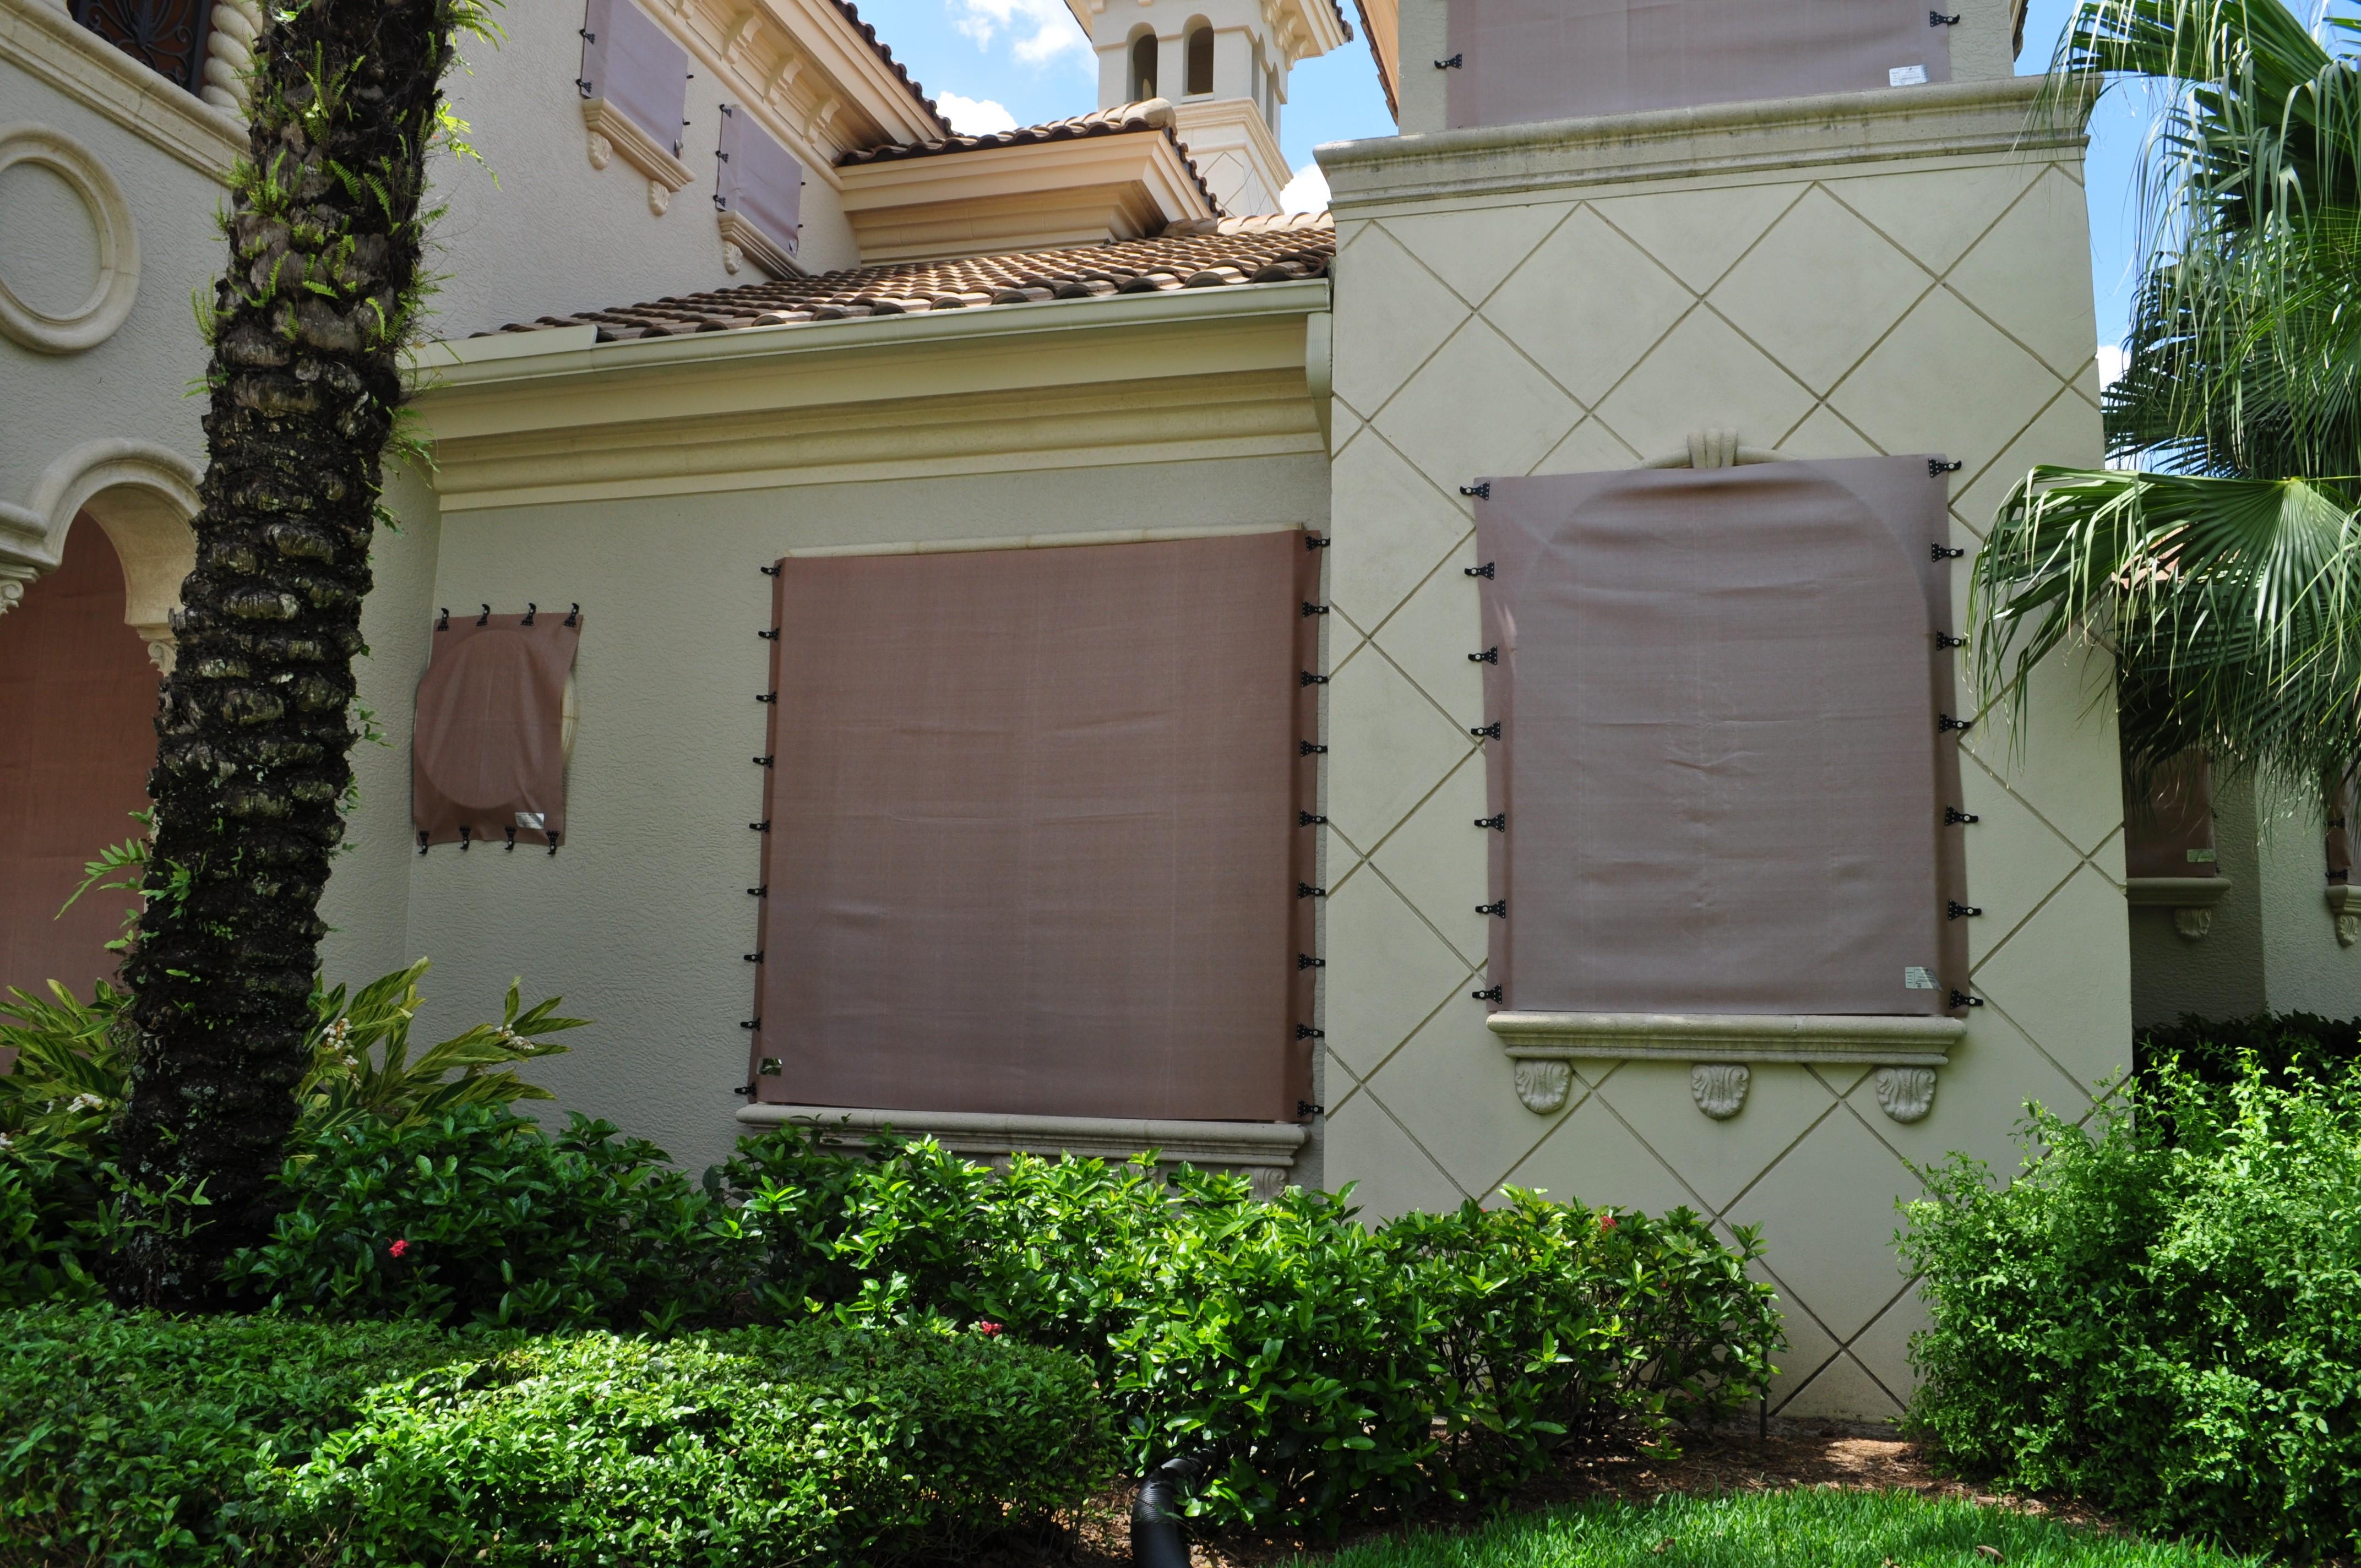 Hurricane Protection From Naples Shutter